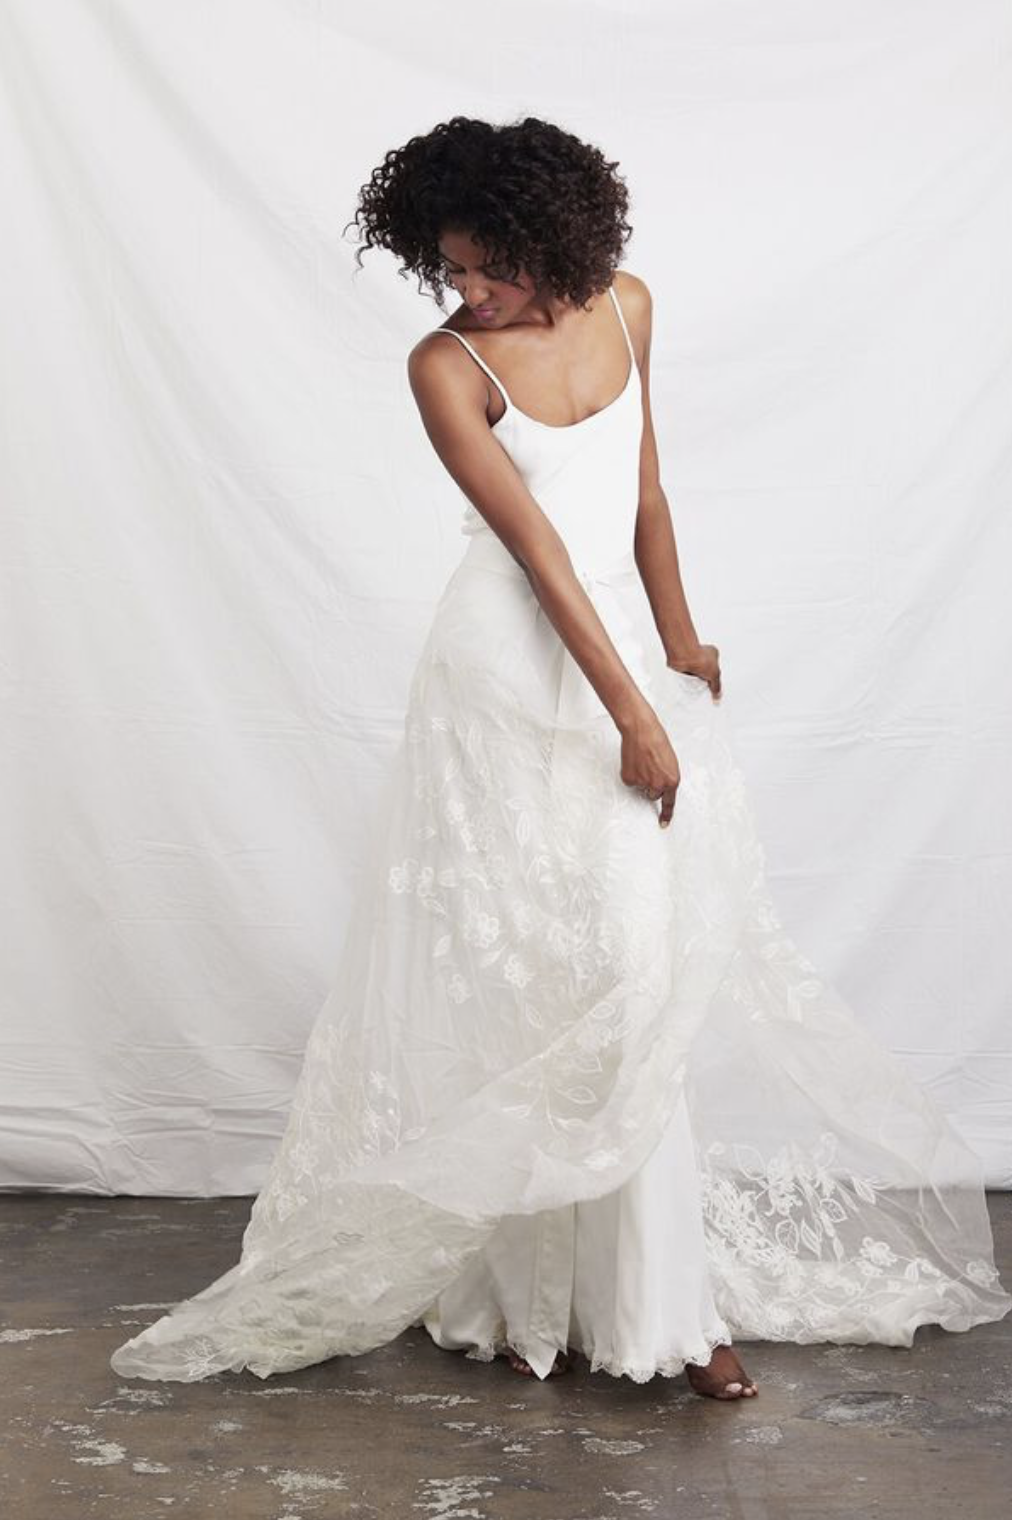 flora wrap skirt dress photo